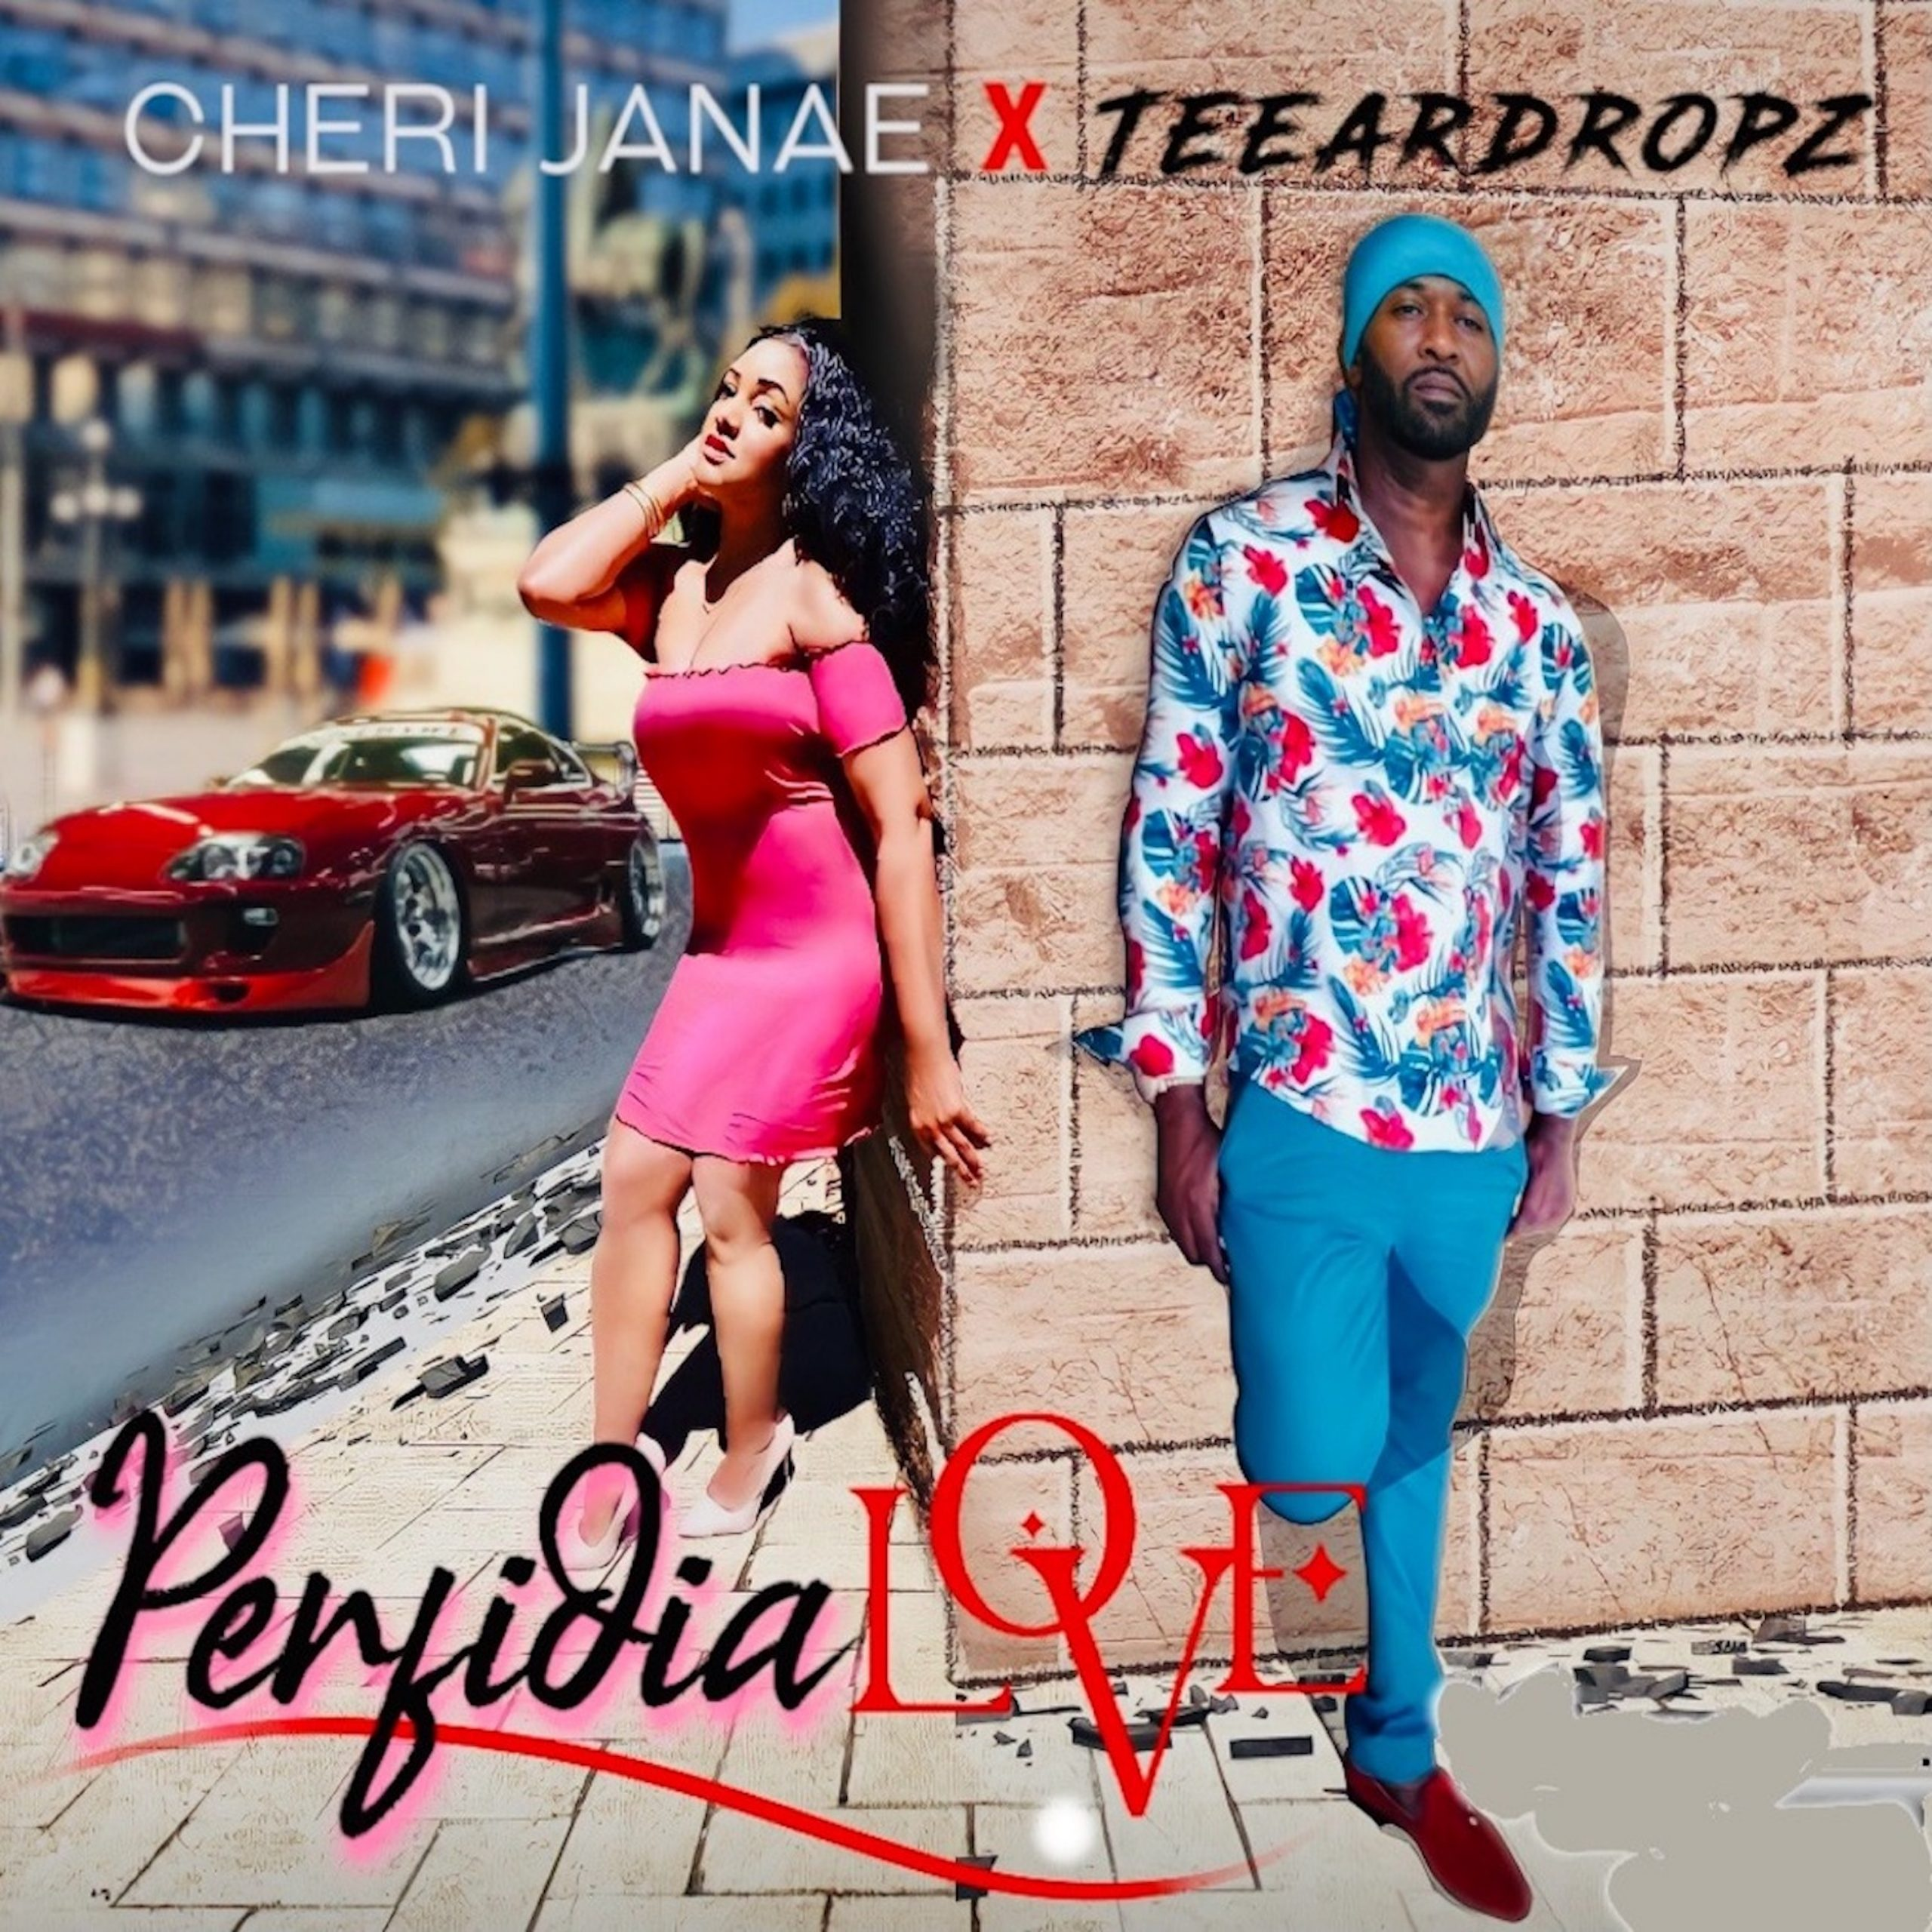 Along with rising reggae/reggaeton star Teeardropz, 'Cheri Janae' releases ' Perfidia Love'